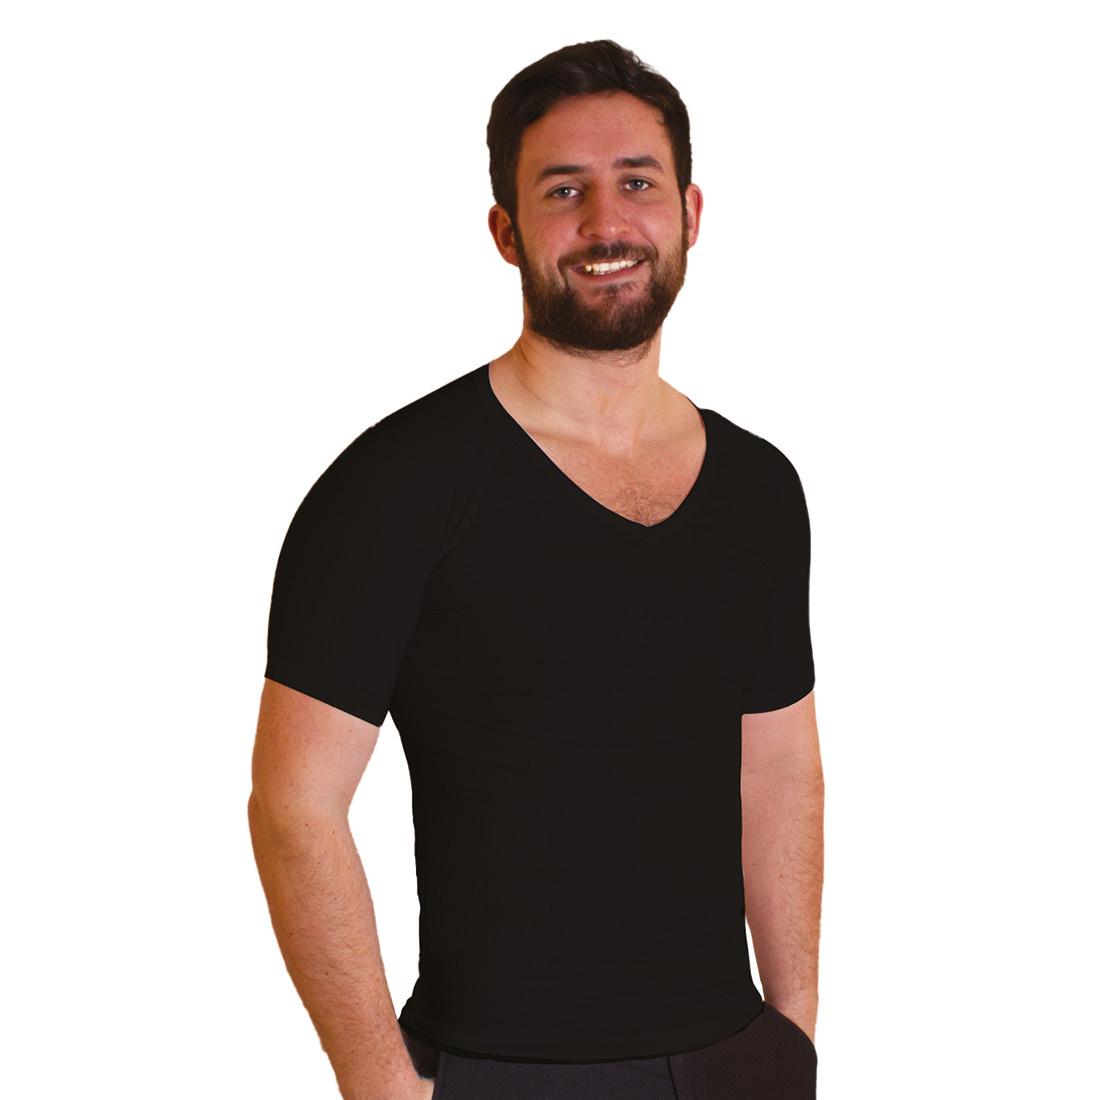 An image of Tone Tee Black T-shirt XXL